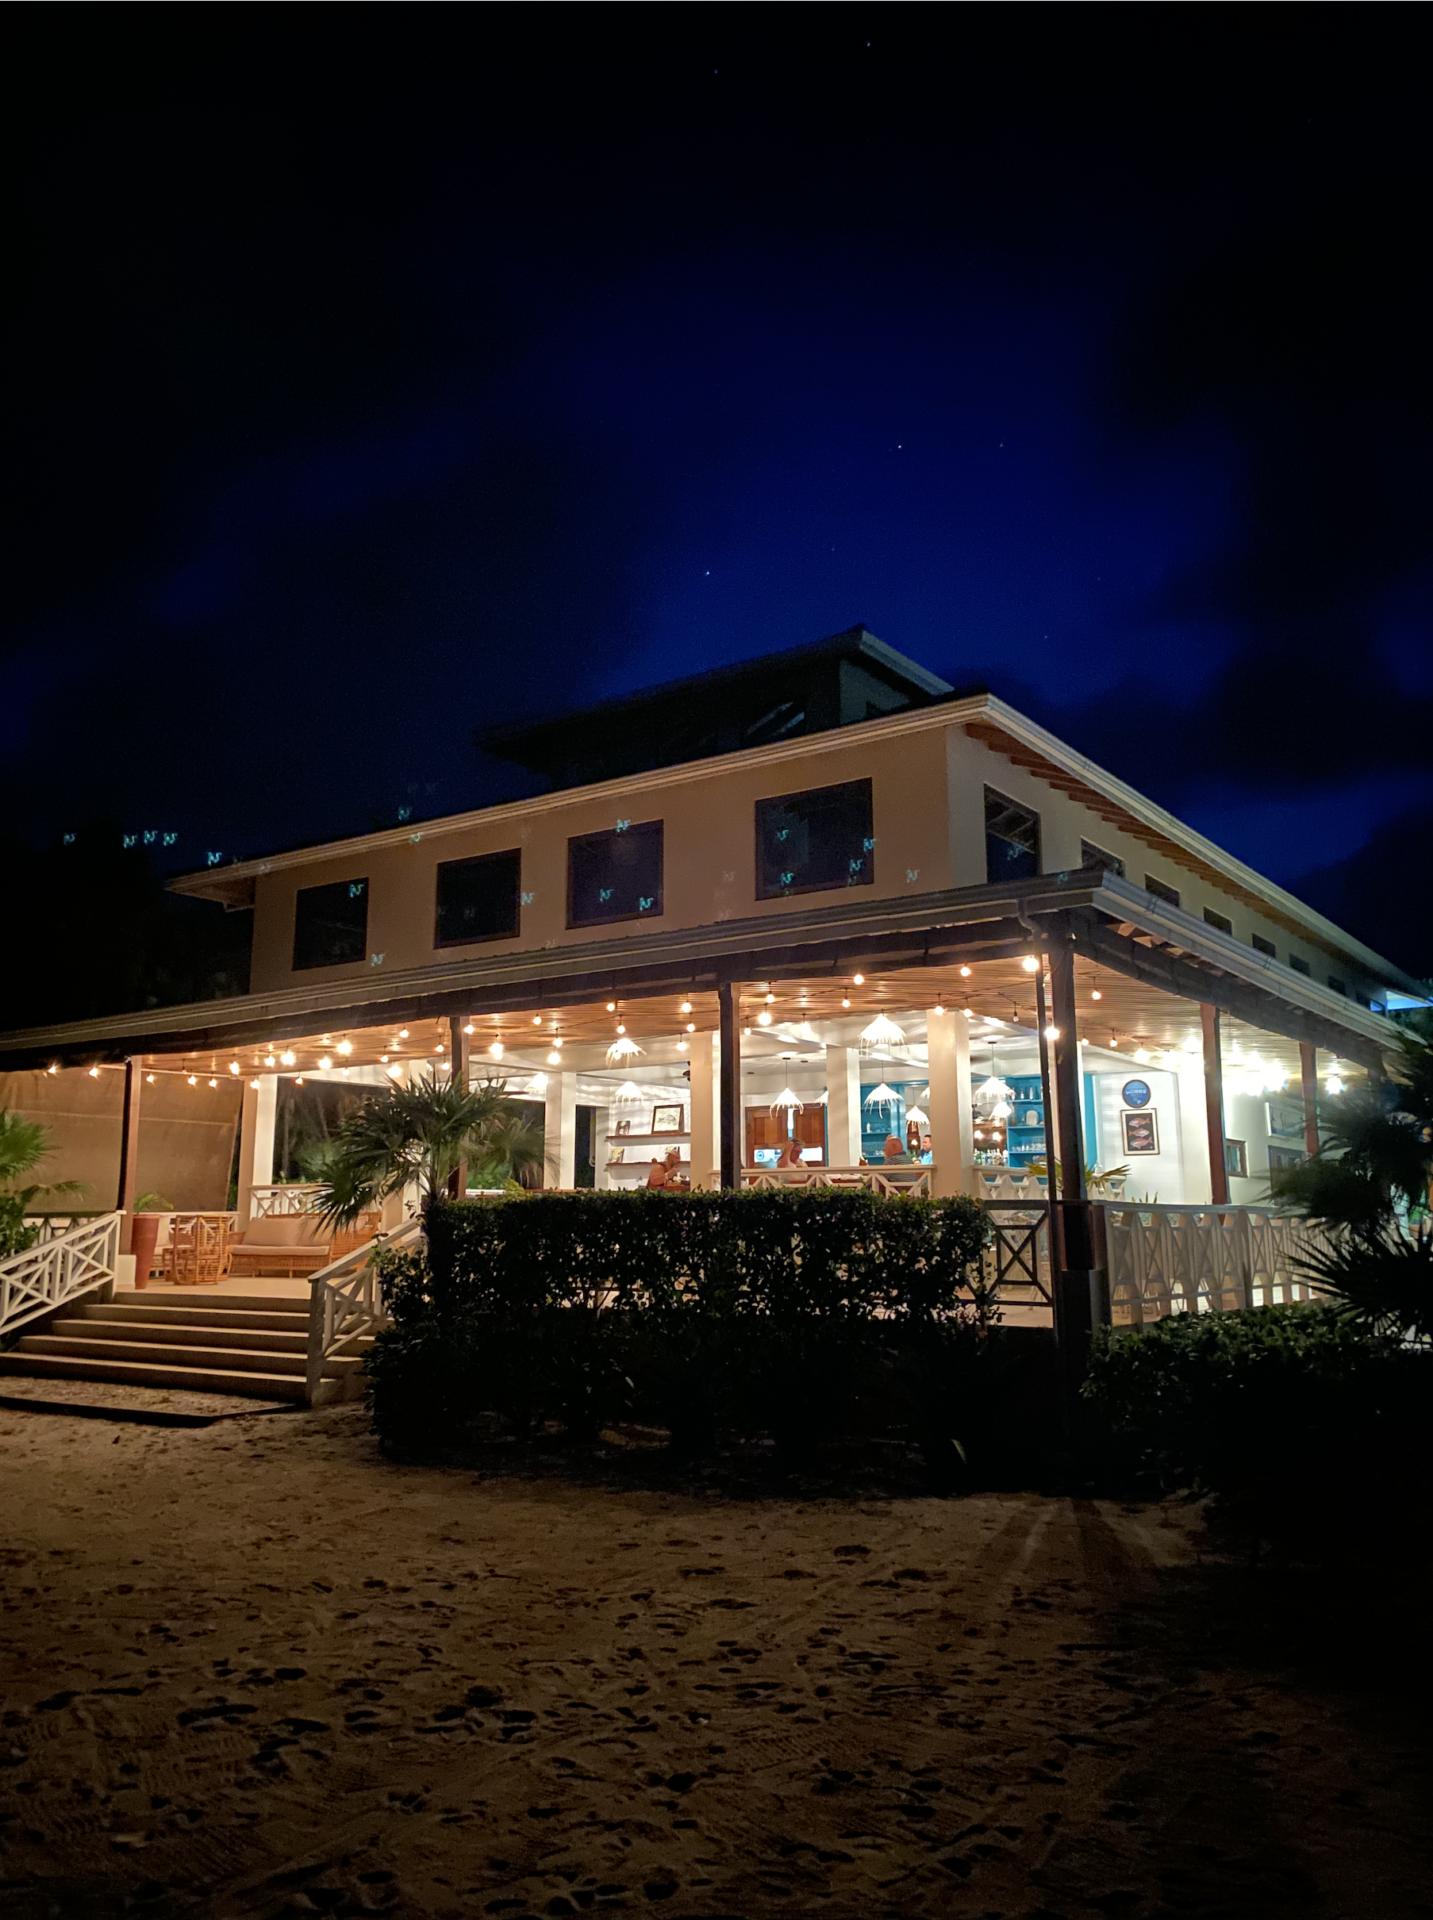 naia-resort-spa-placencia-belize-night